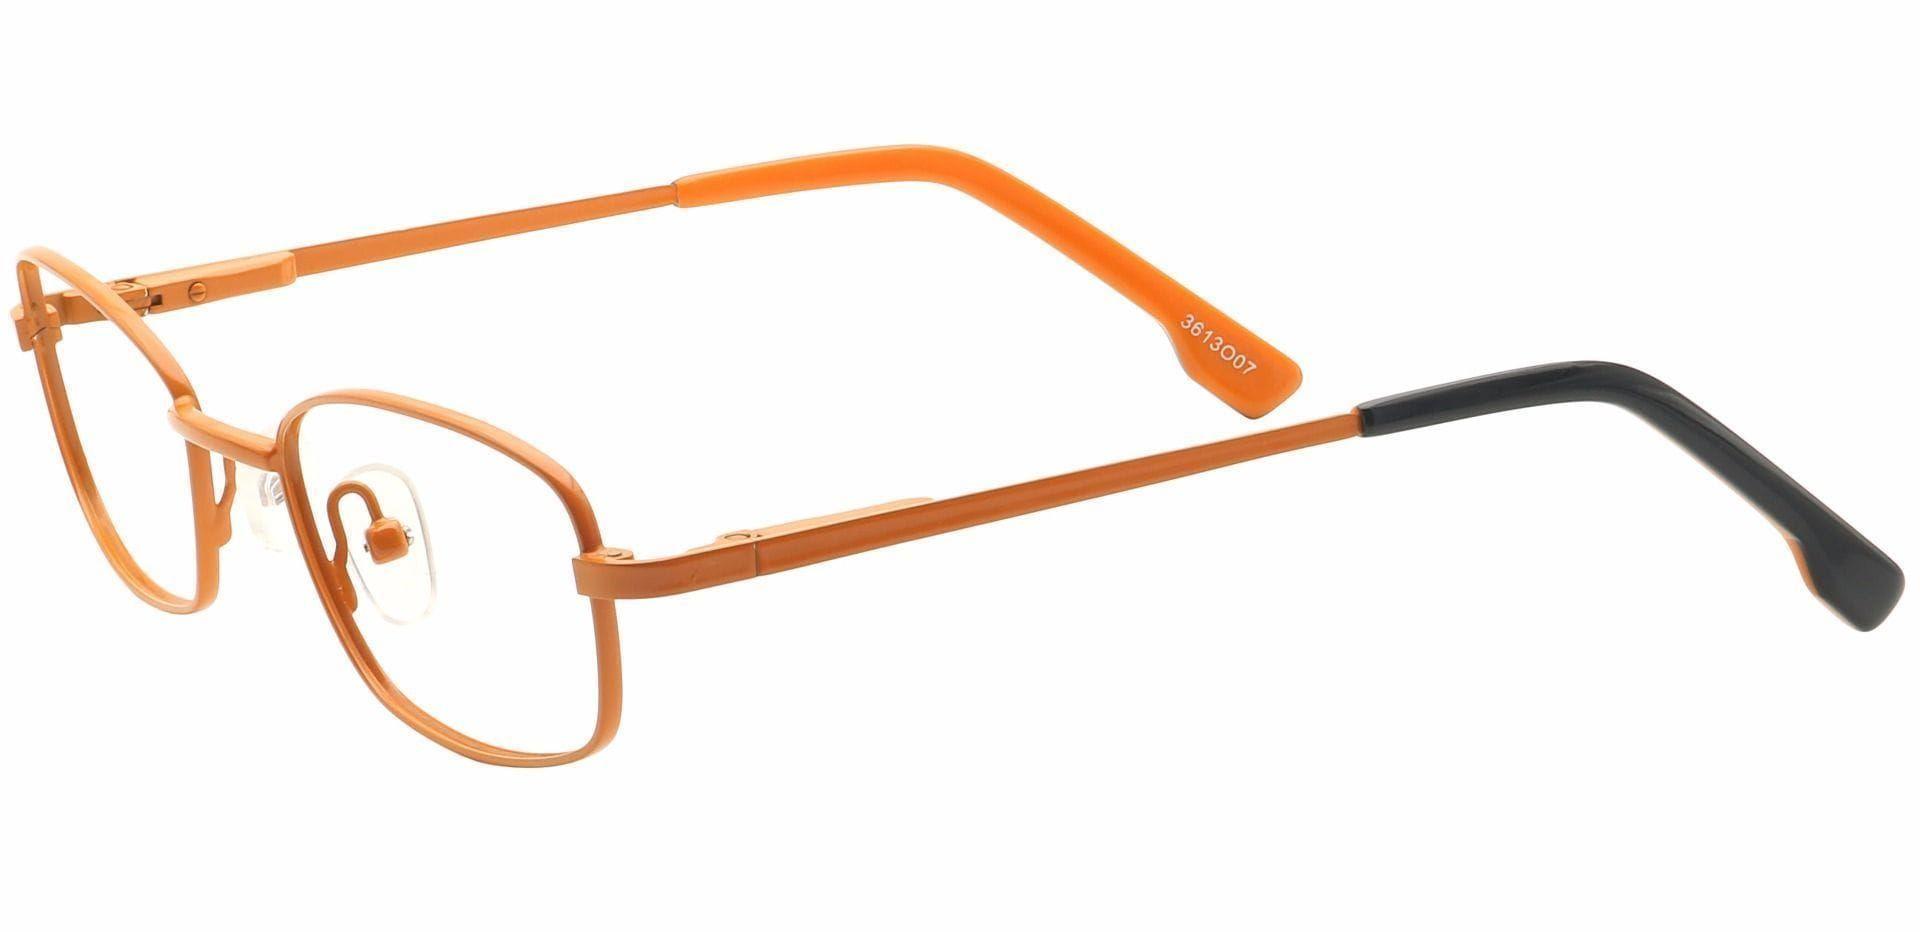 Gil Rectangle Reading Glasses - Orange